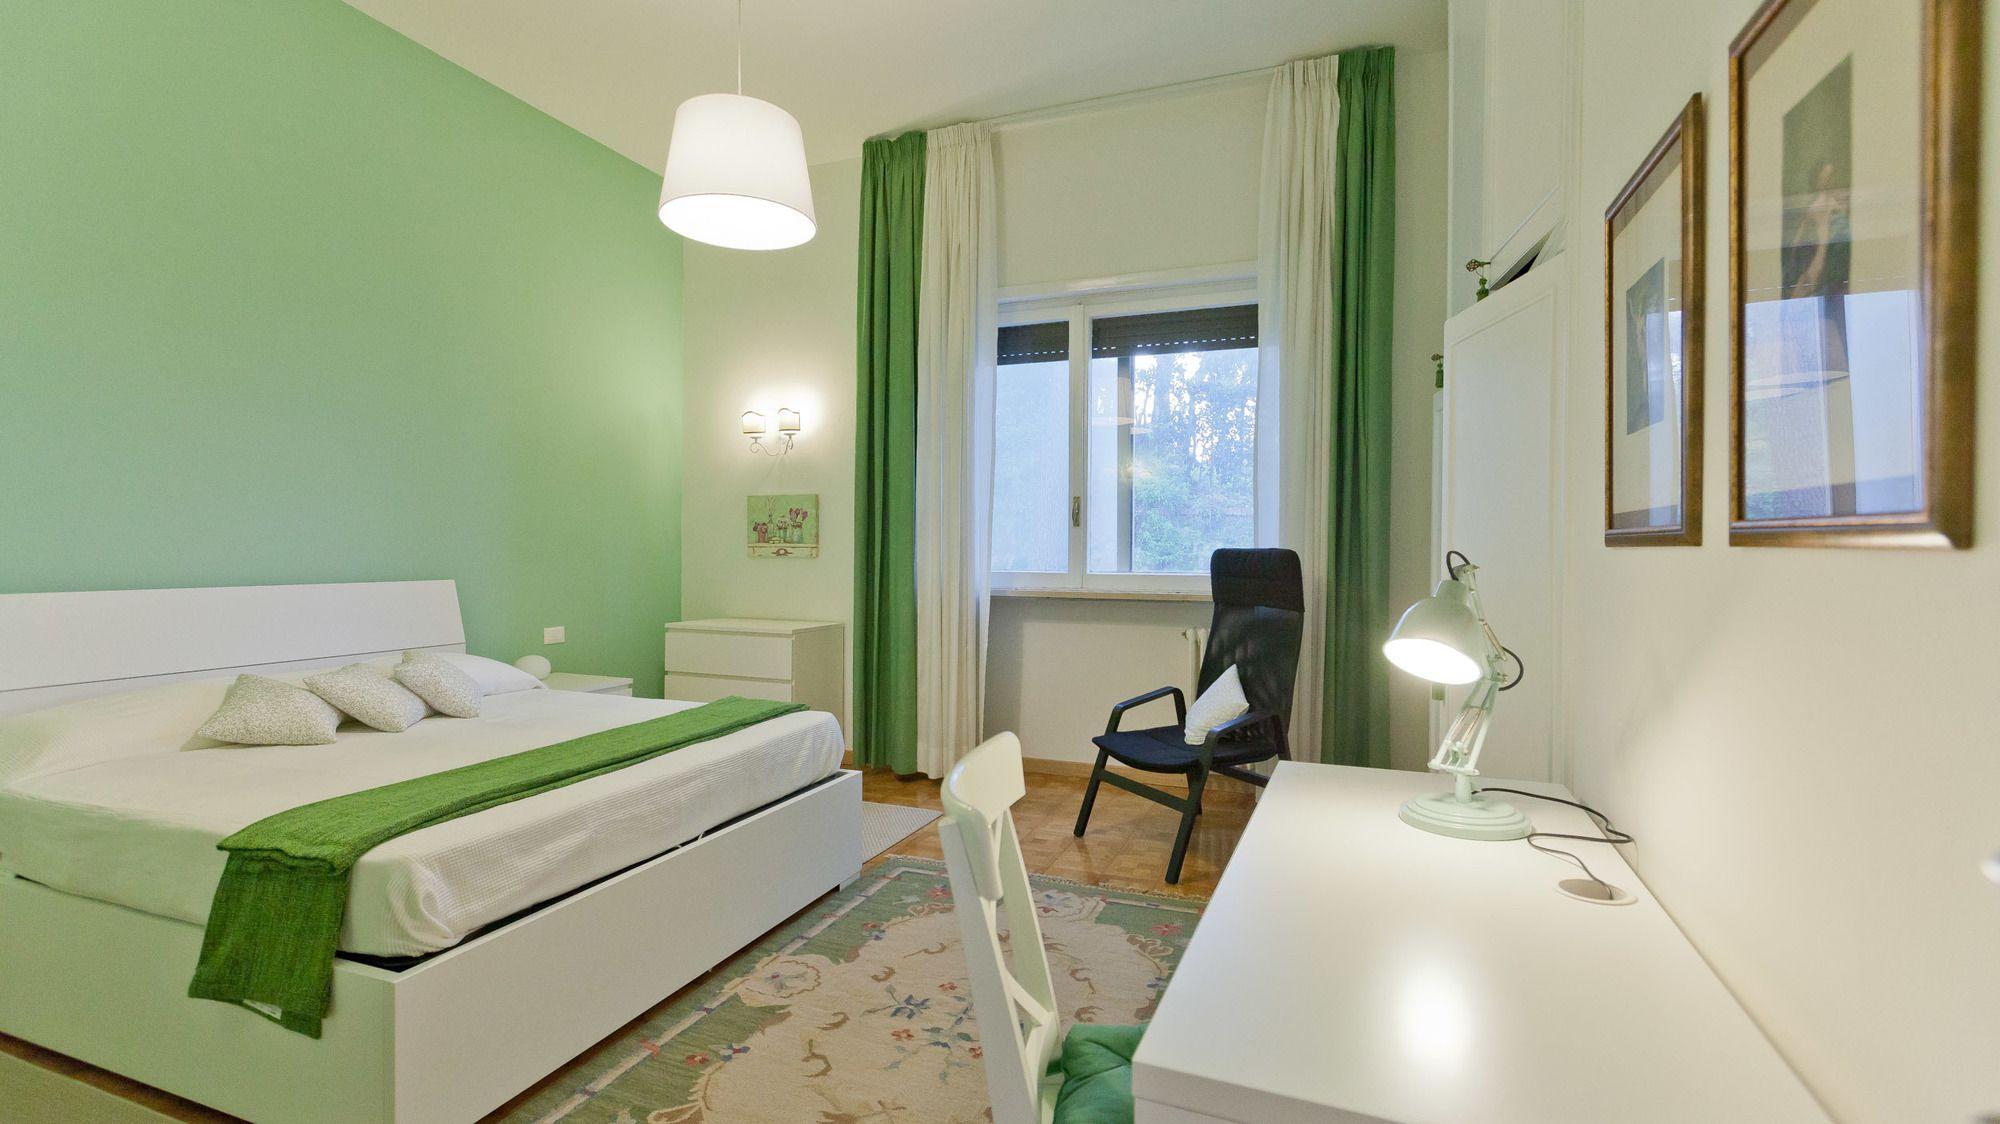 Circo Massimo Apartment 1